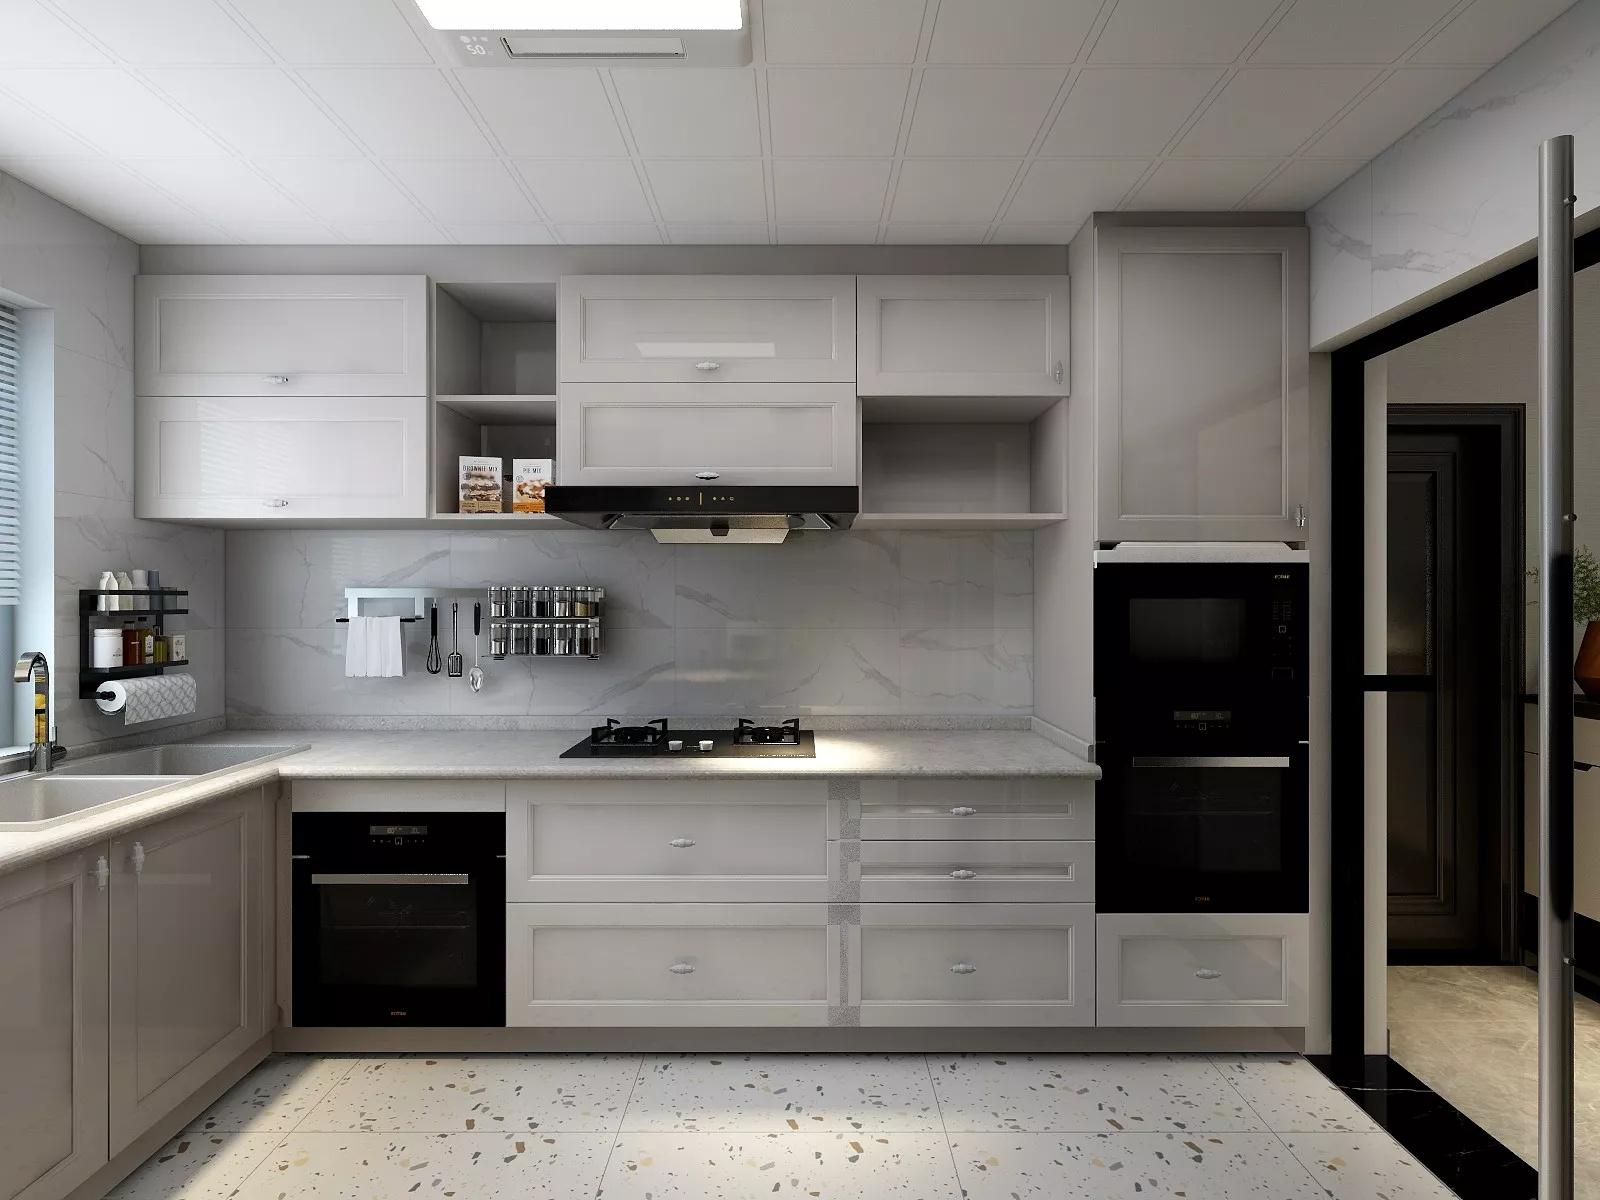 u字形簡約風格廚房櫥柜裝修效果圖